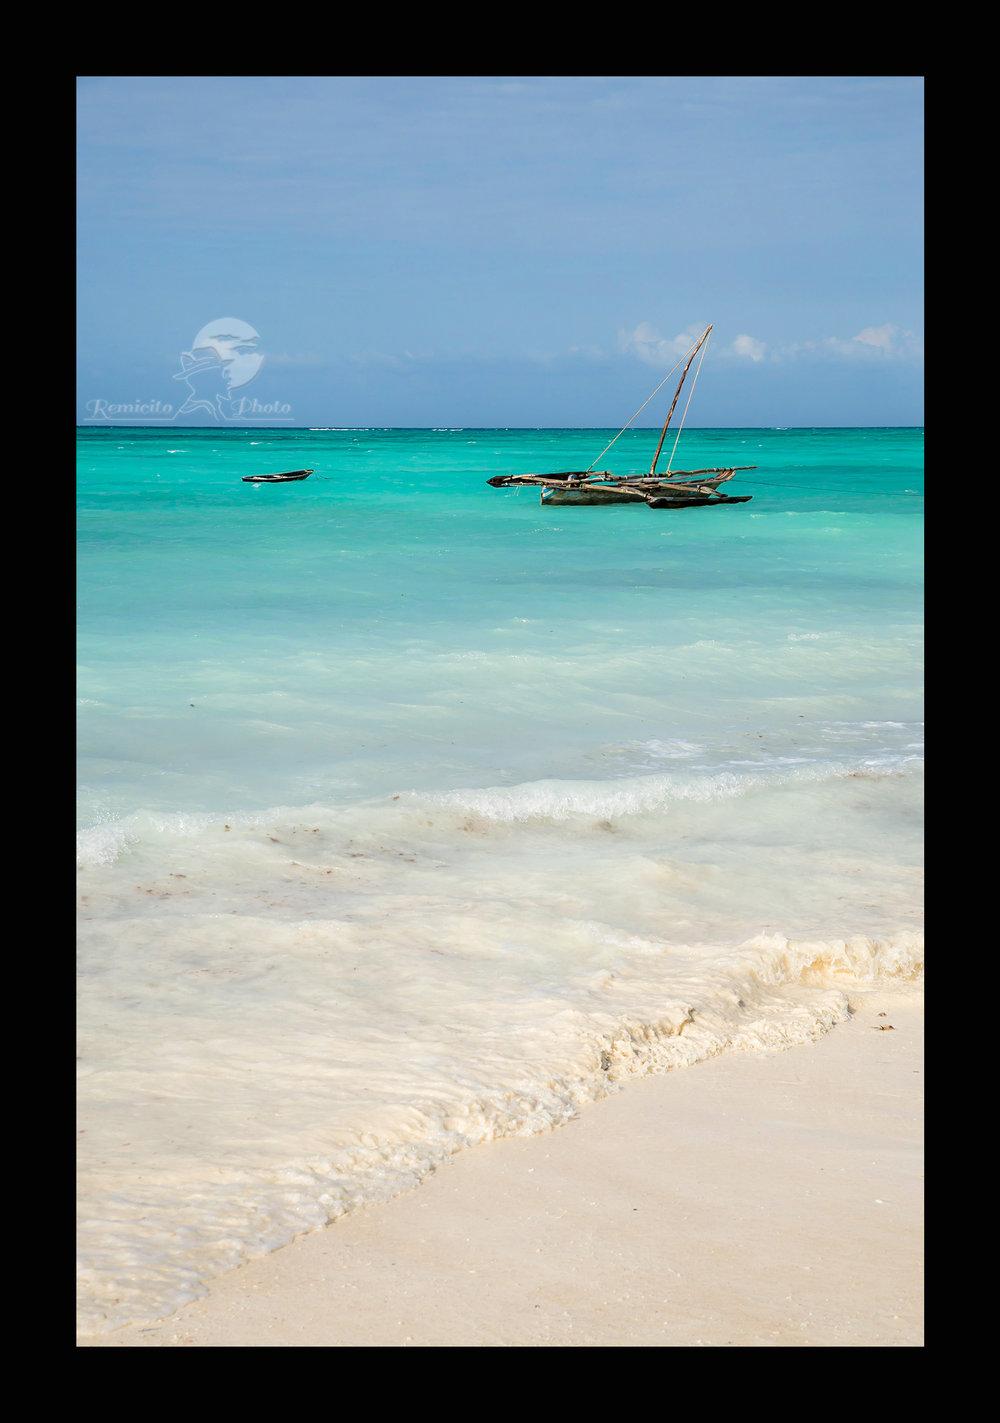 remicito photo, image du jour, photo du jour, photo of the day, photo plage zanzibar, eau turquoise Zanzibar, bateau pêche Zanzibar, belle photo plage, photo eau turquoise, eau limpide, plage de sable blanc, île zanzibar, photo tanzanie plage